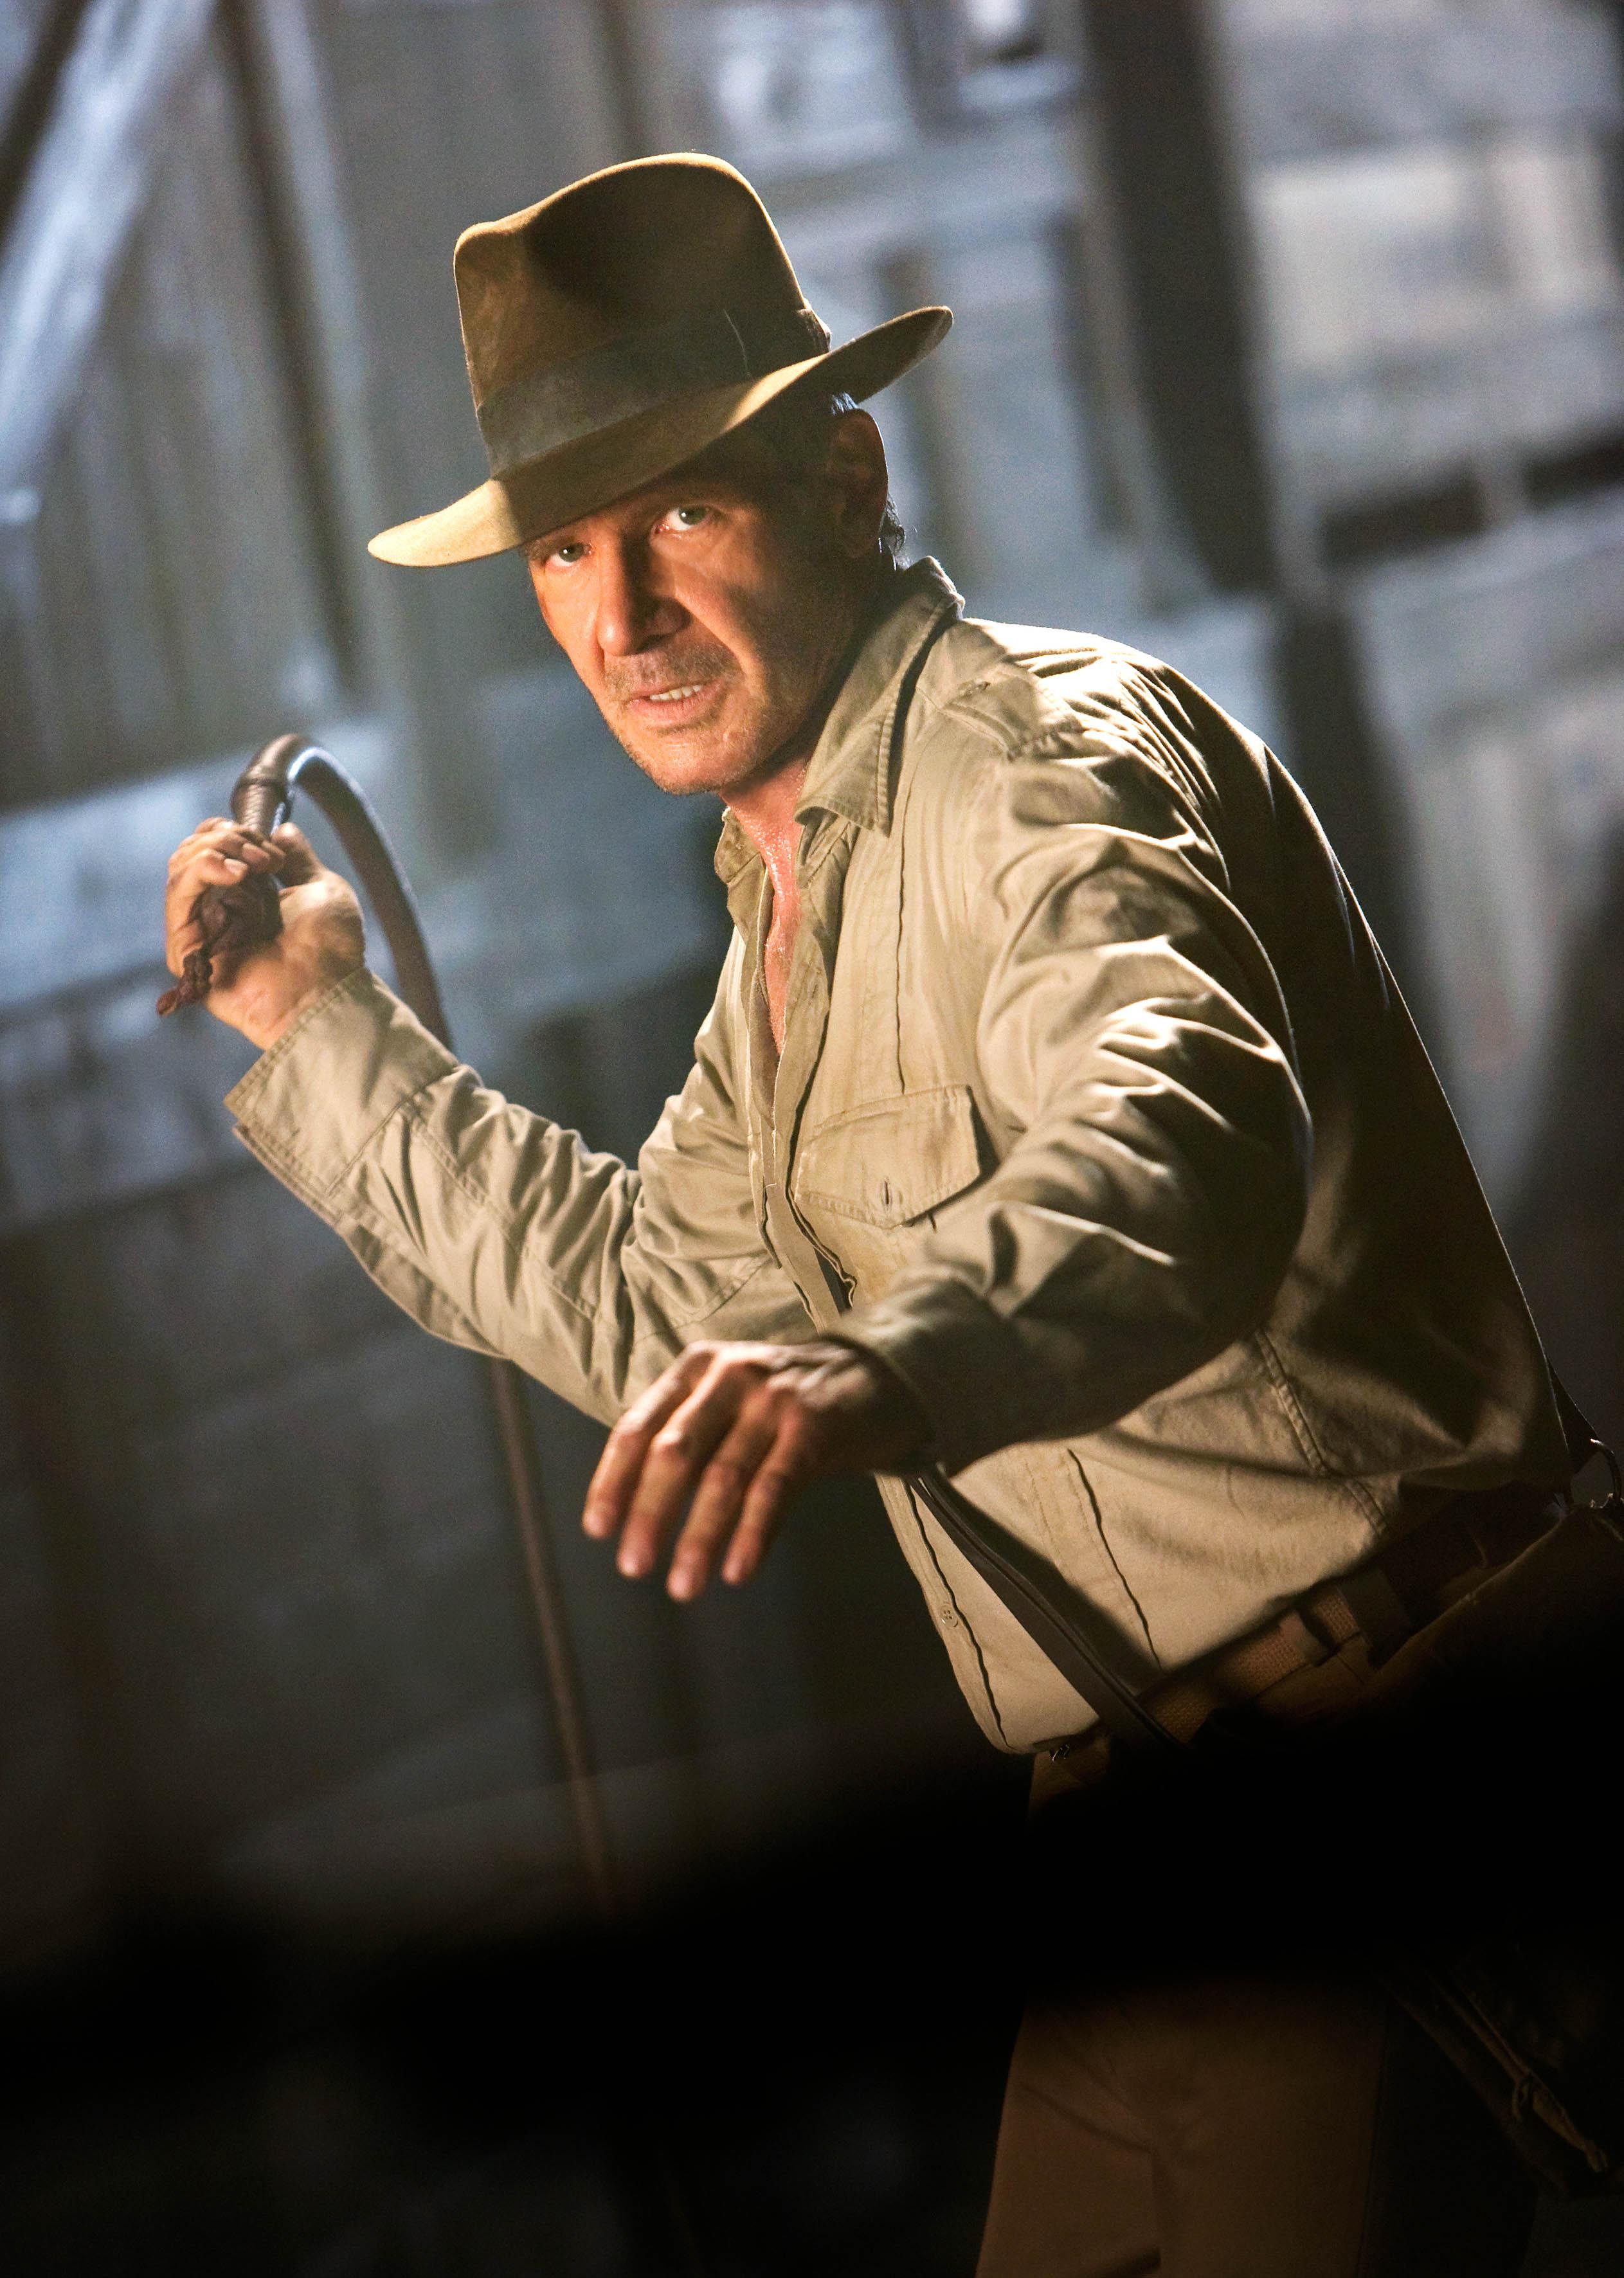 Indiana Jones And The Kingdom Of Crystal Skull, Sky Movies